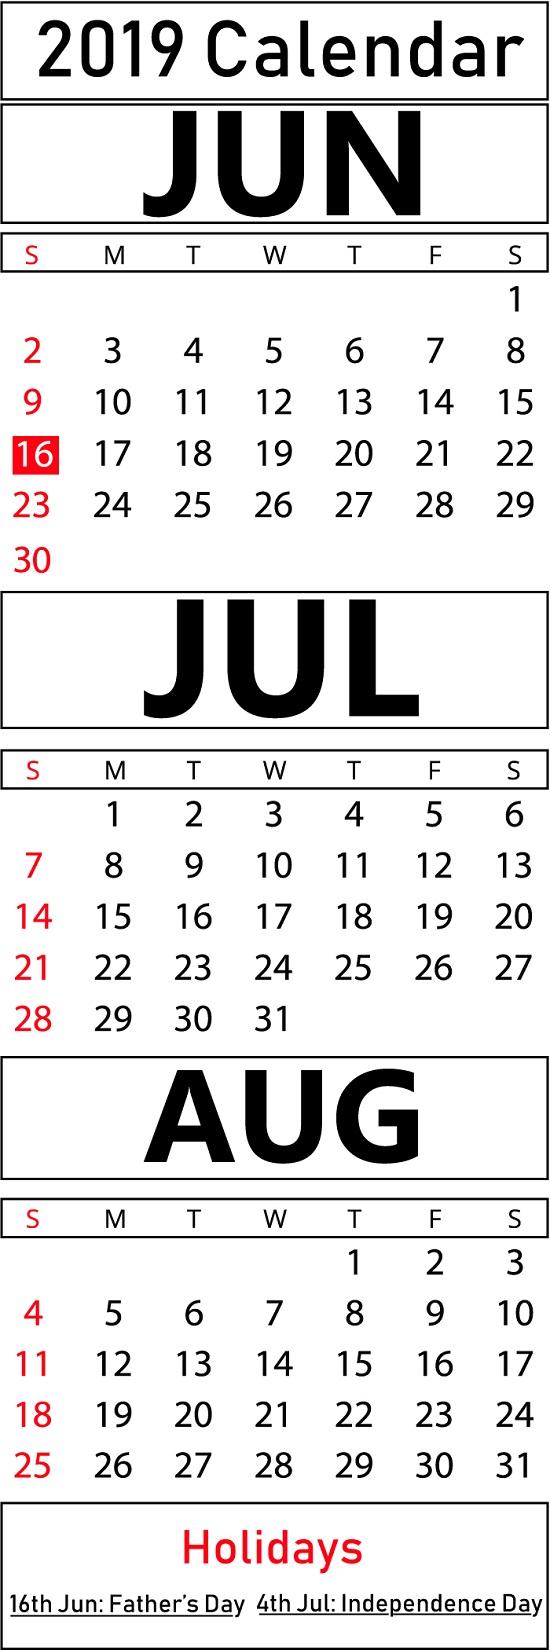 Printable June & July & August 2019 Calendar Templates | Printable for June And July Blank Calendar